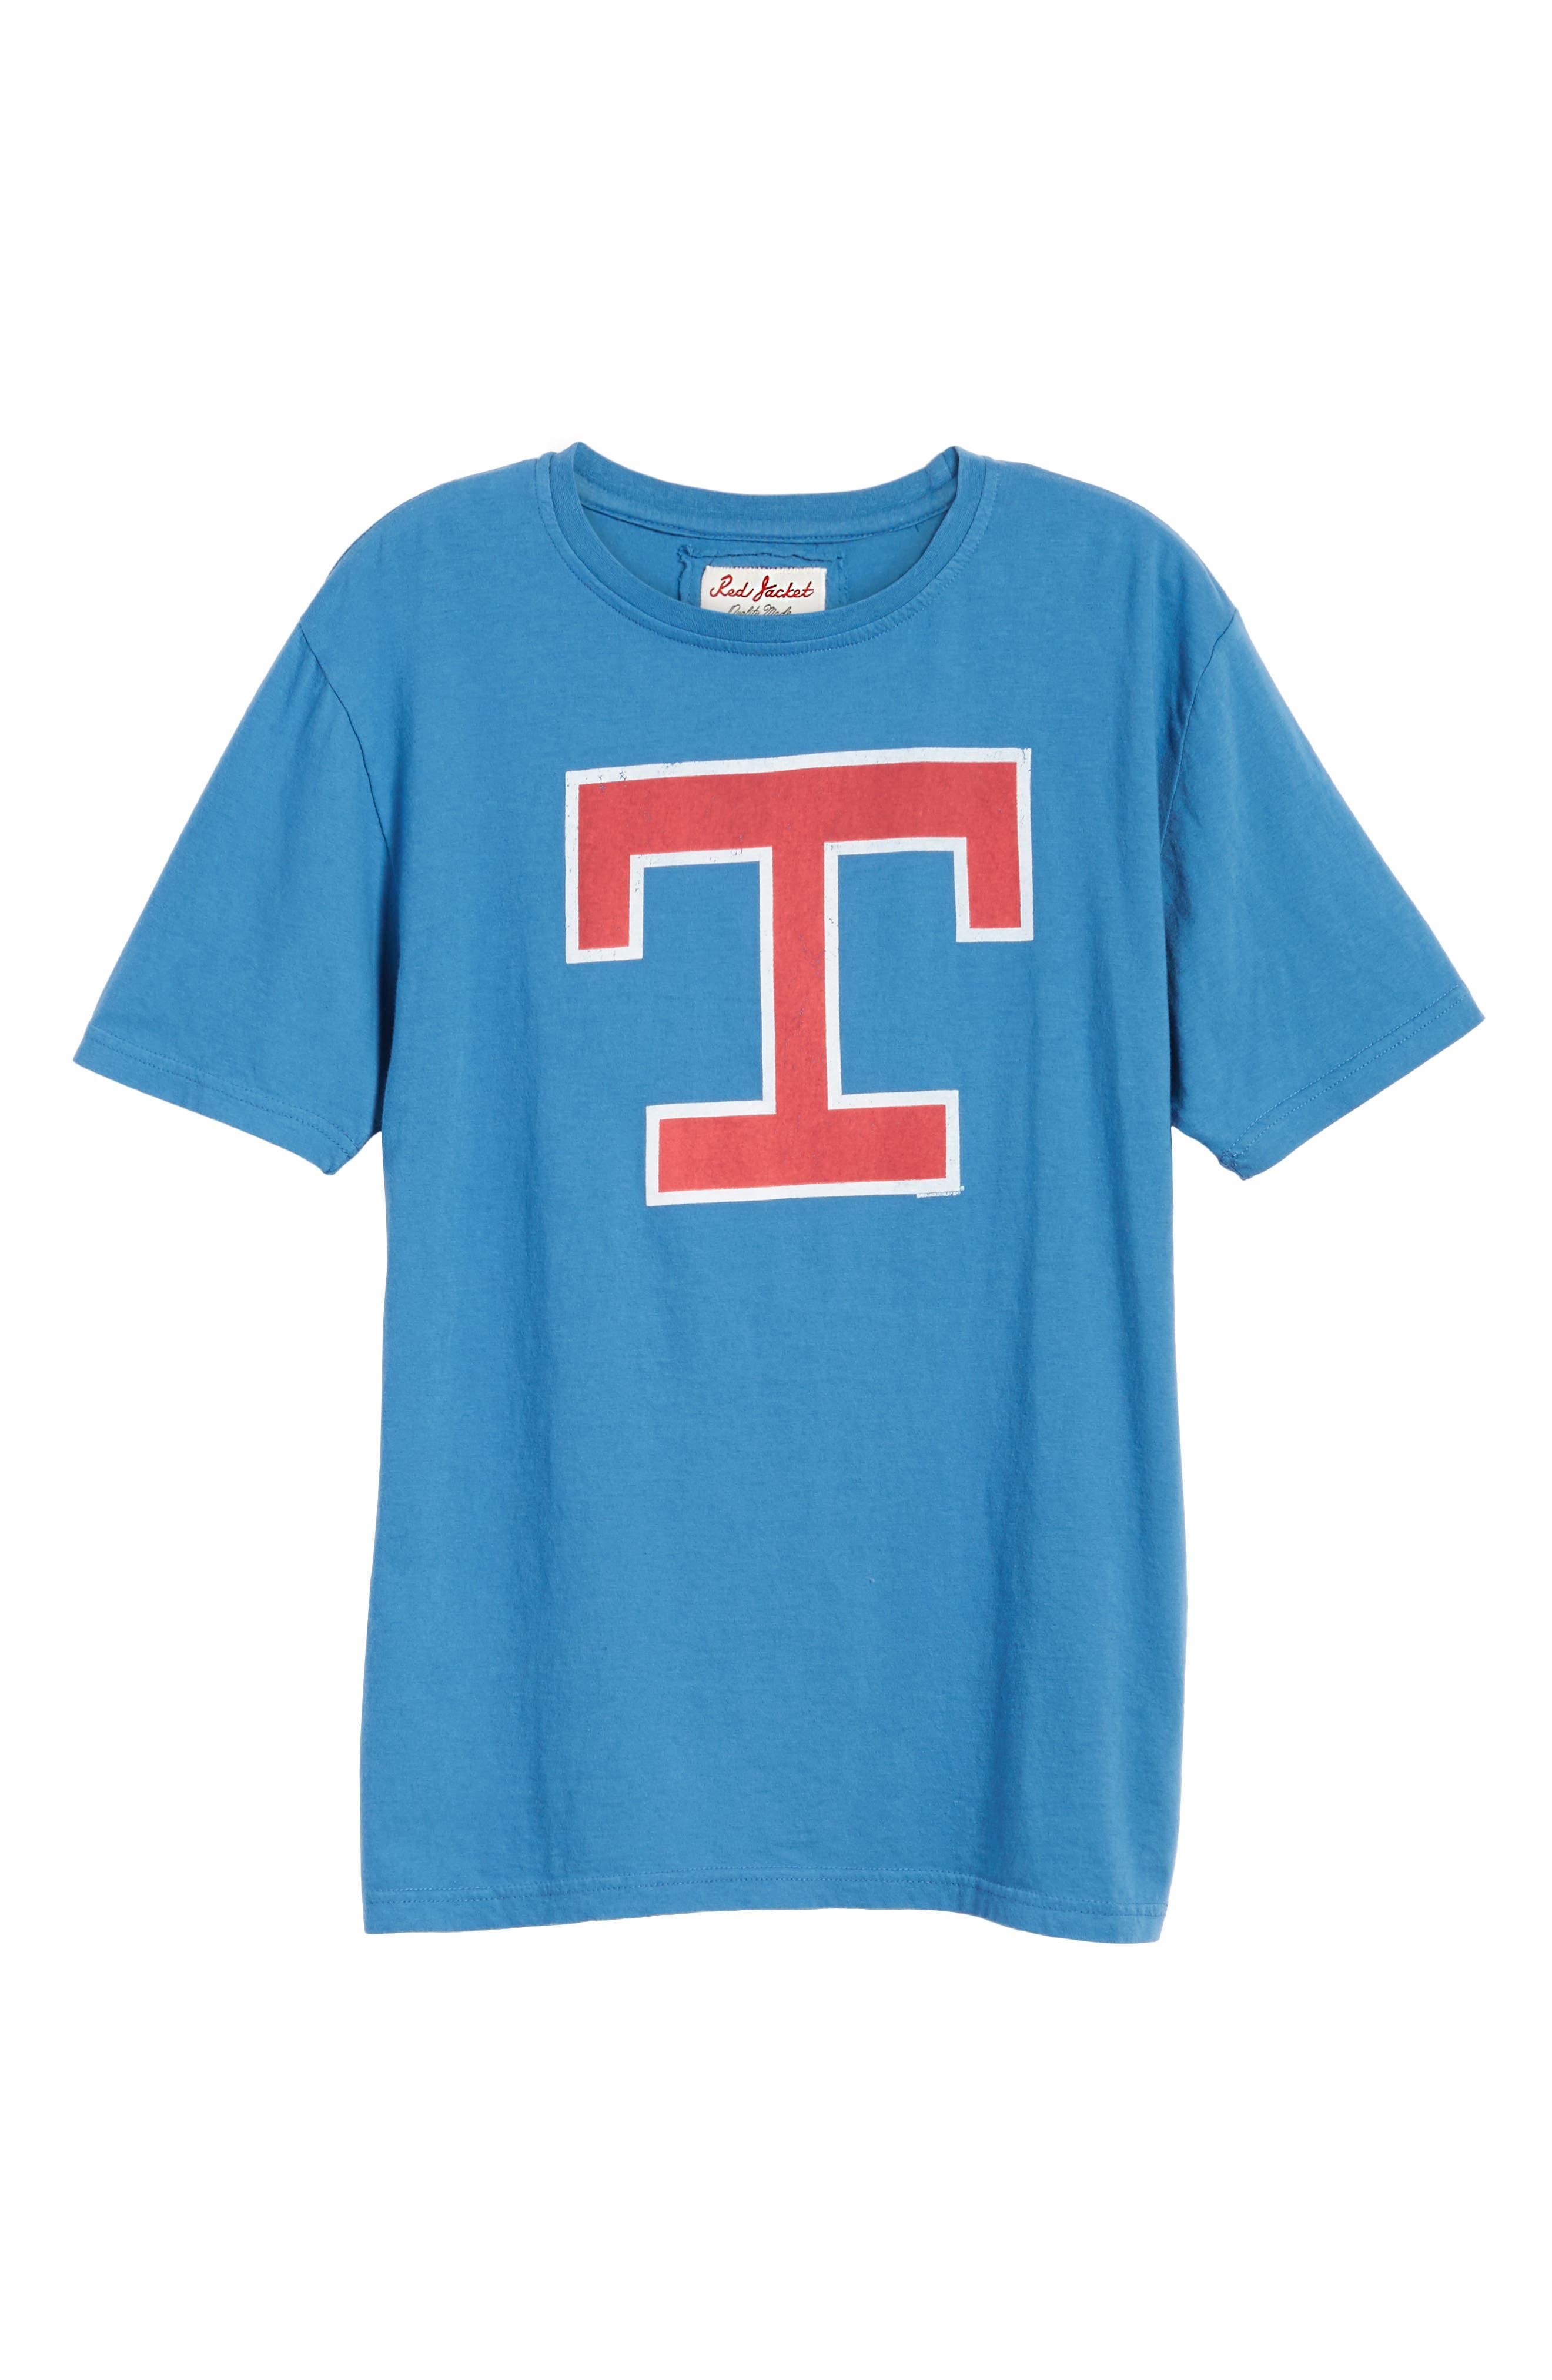 Brass Tack Texas Rangers T-Shirt,                             Alternate thumbnail 6, color,                             450